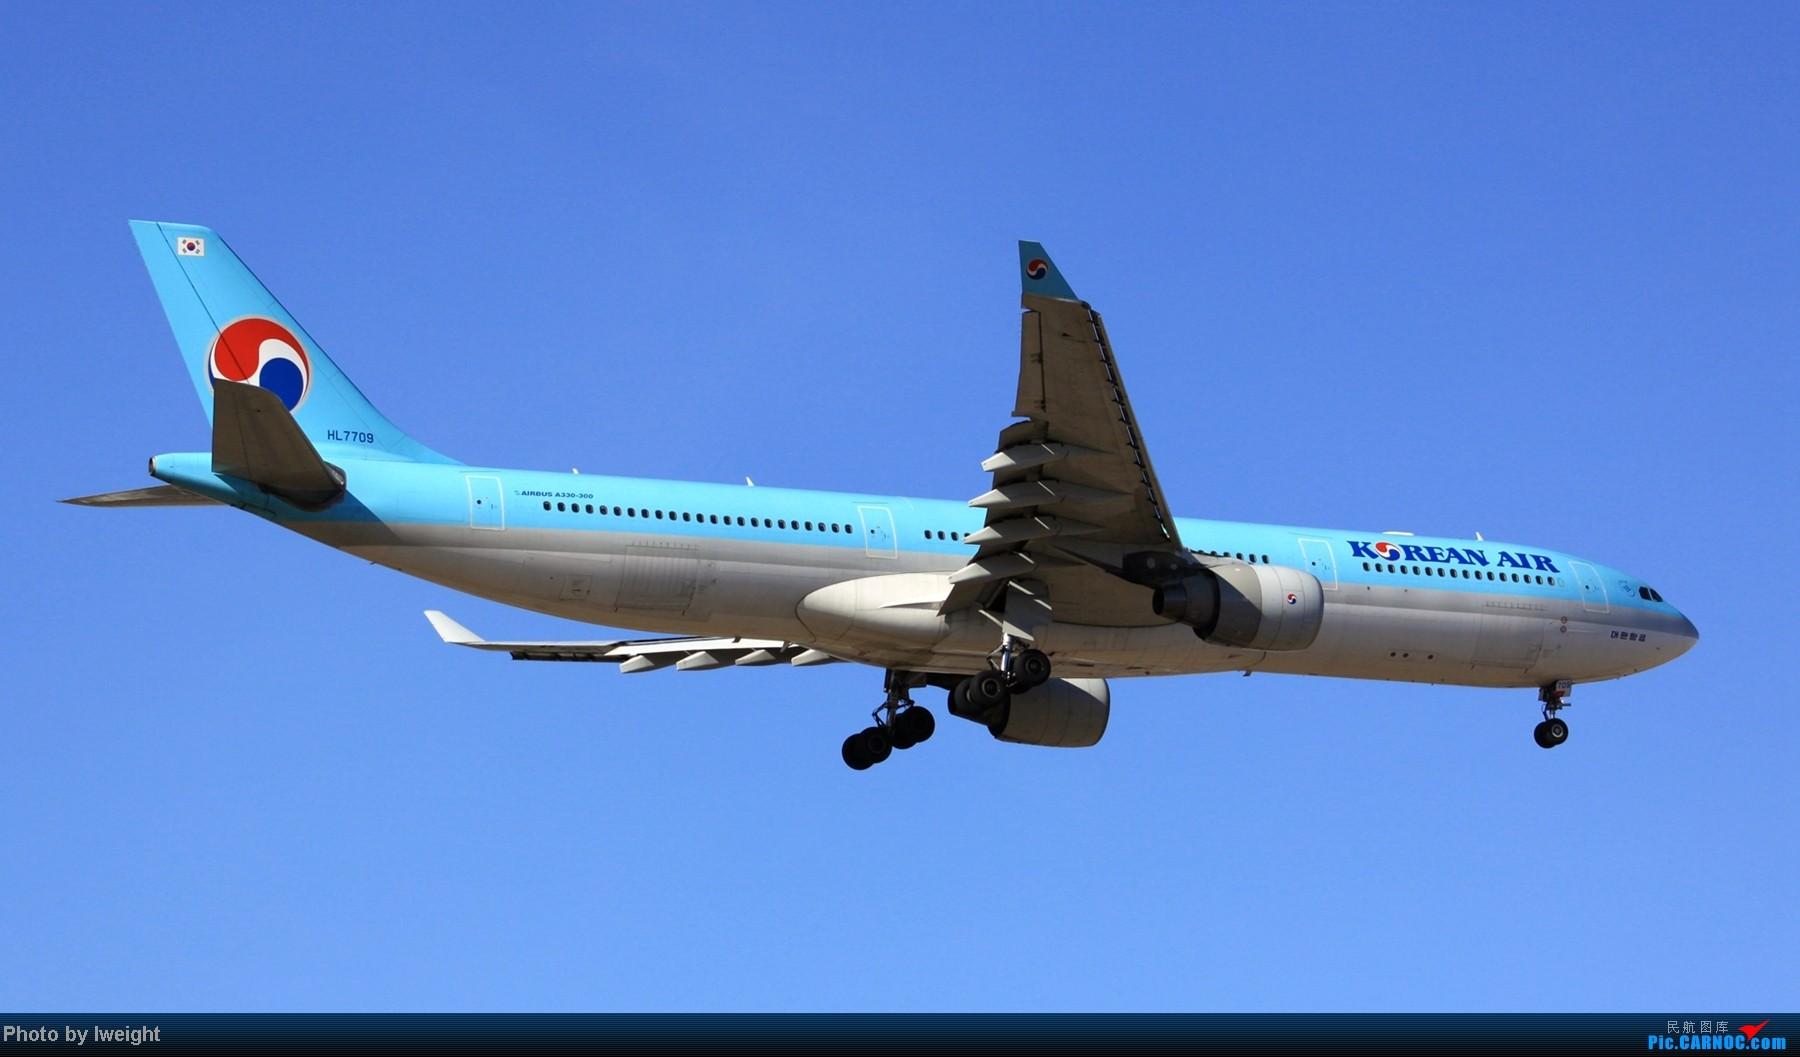 Re:[原创]春节期间首都机场拍机汇报 AIRBUS A330-300 HL7709 中国北京首都机场